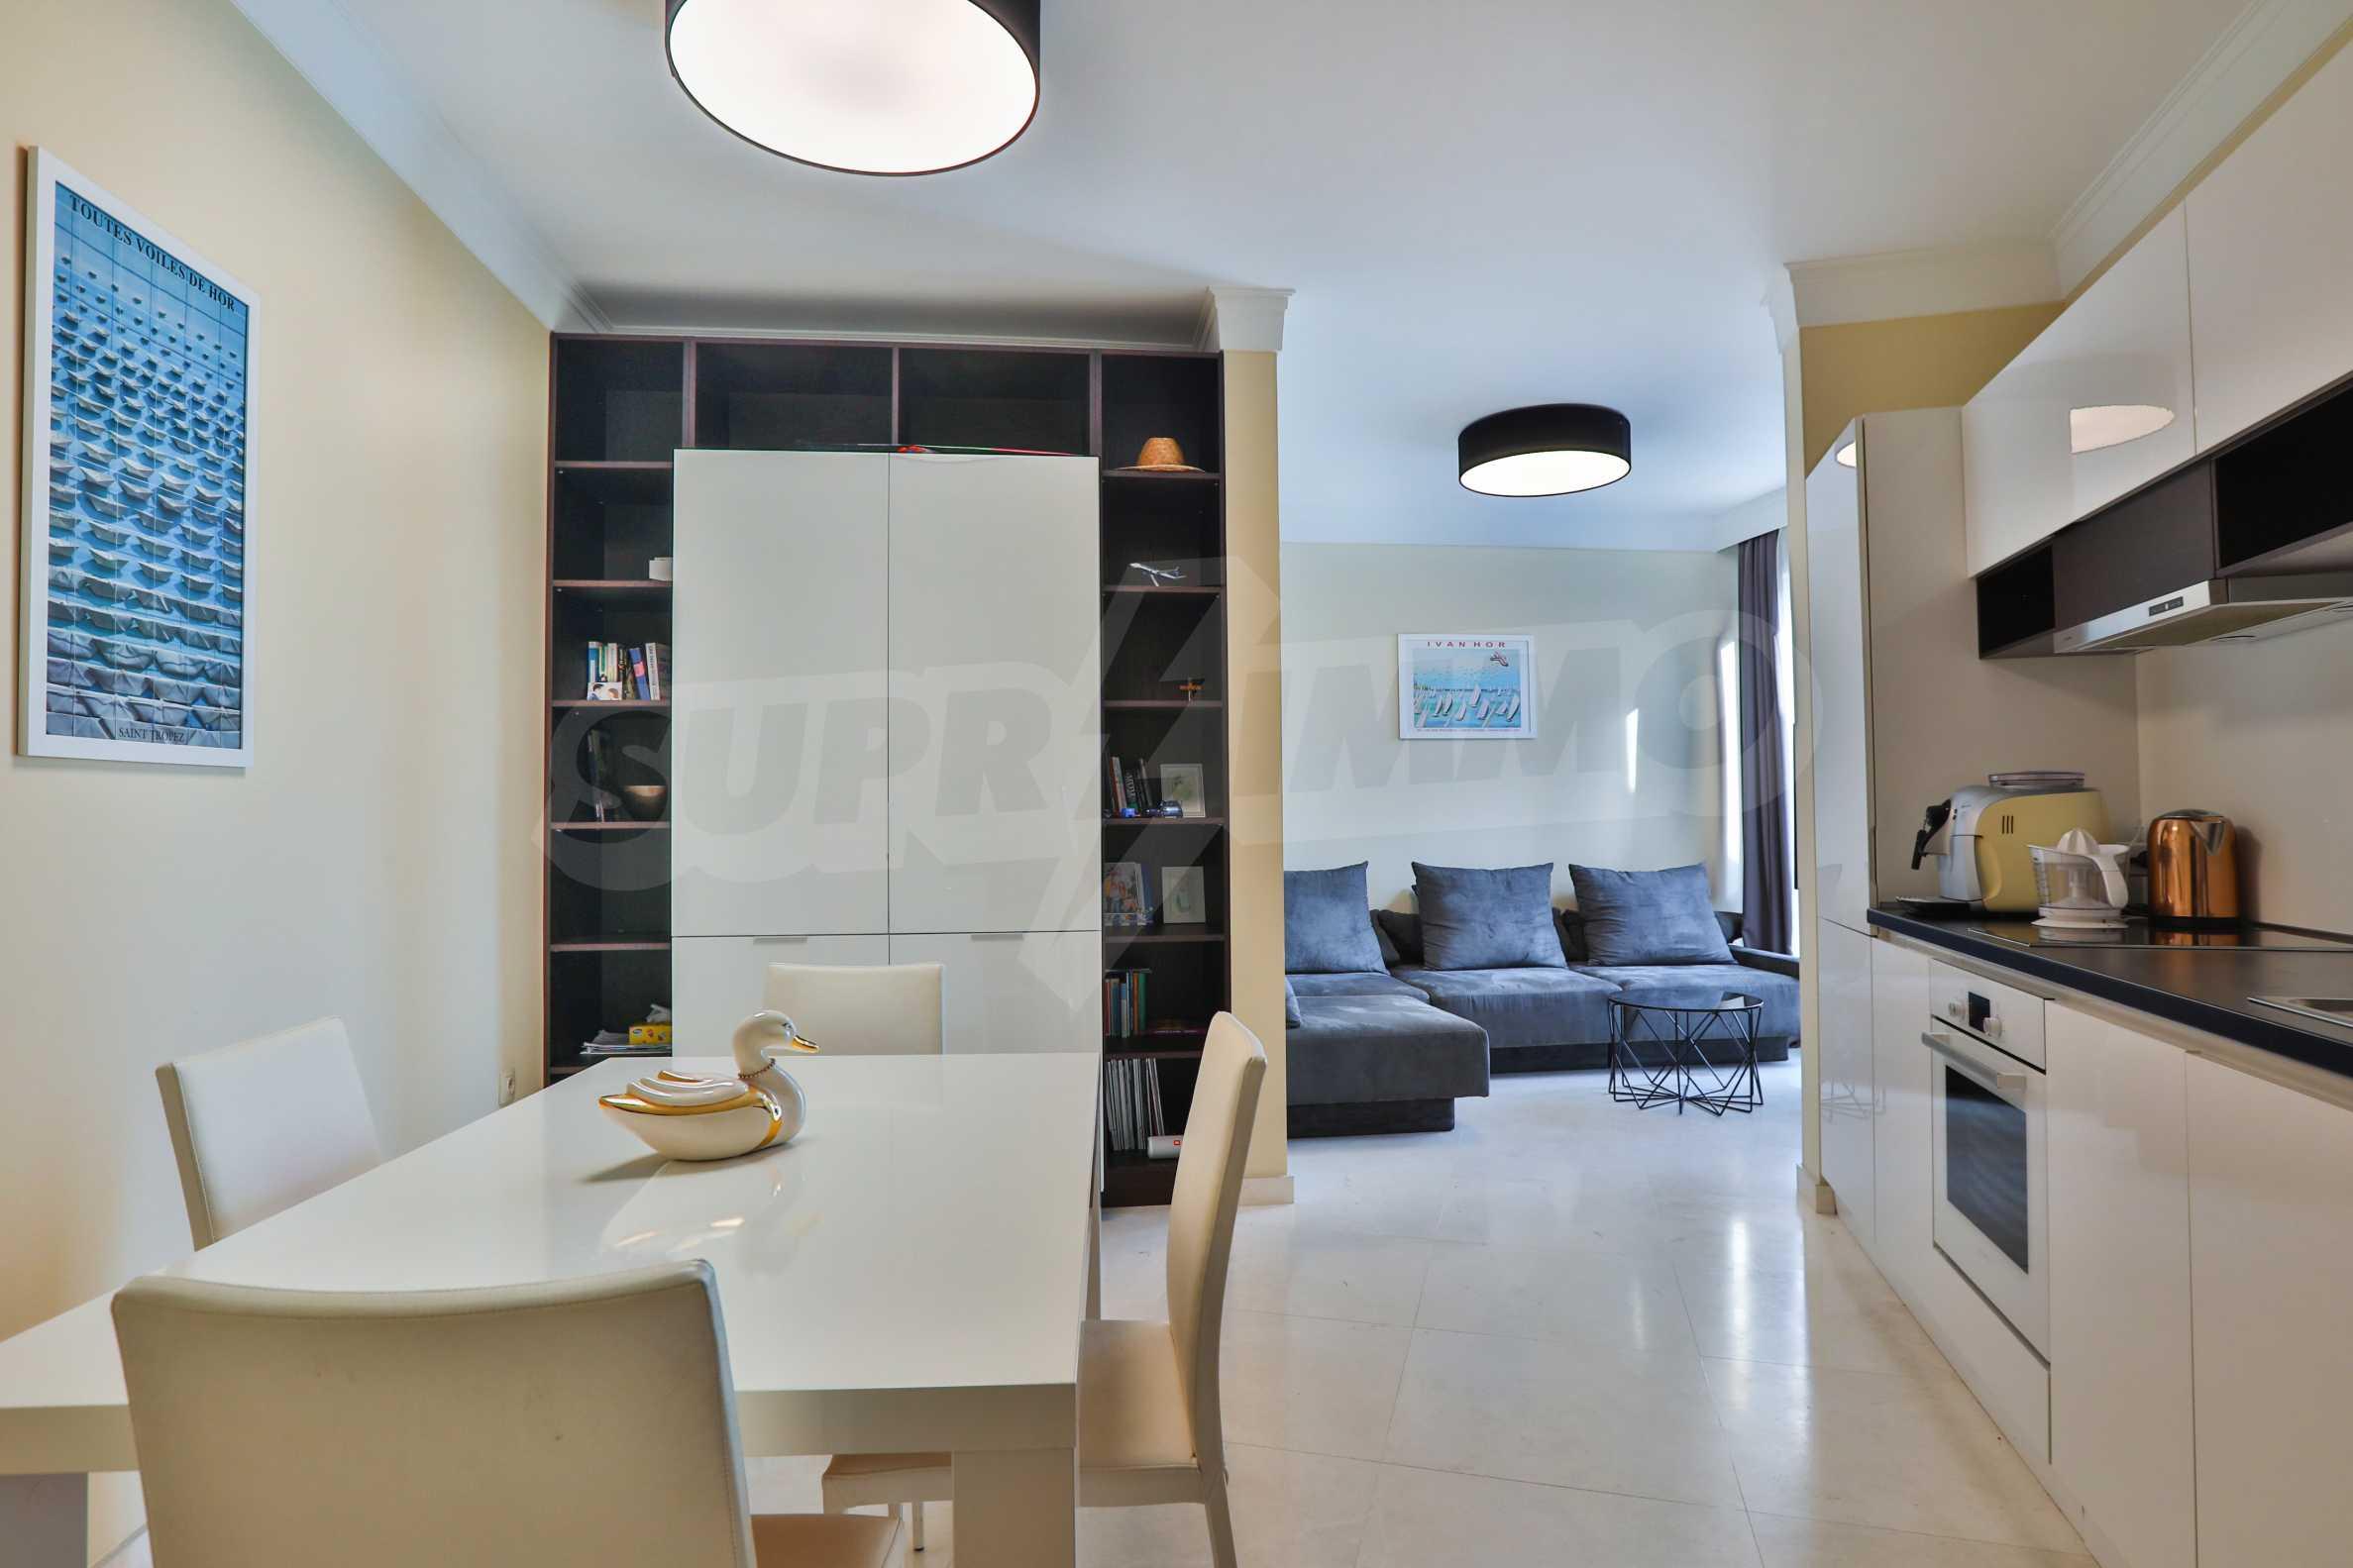 Exclusive 2-bedroom beachfront apartment in the prestigious Belle Époque Beach Residence 1